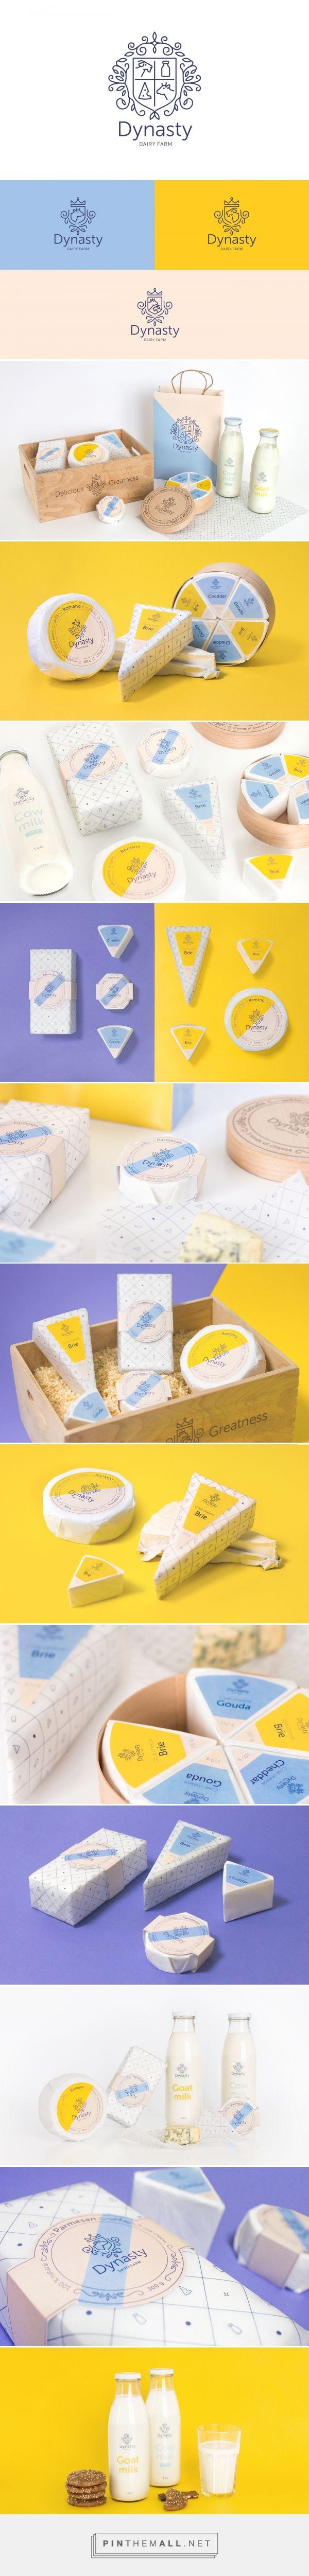 Dynasty Dairy Farm Branding